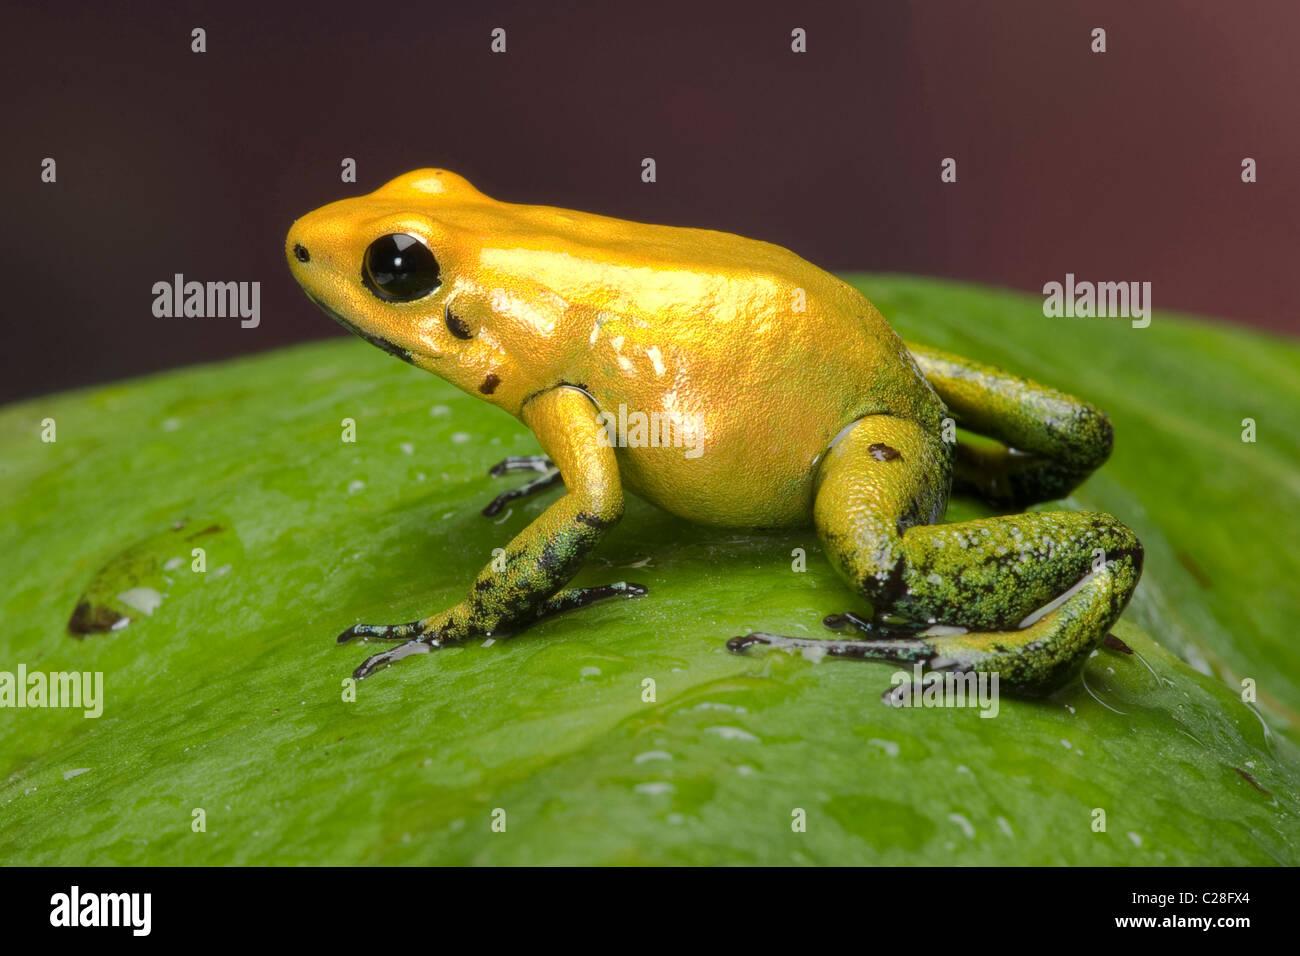 Black-legged Dart Frog (Phyllobates bicolor) on a leaf. Stock Photo